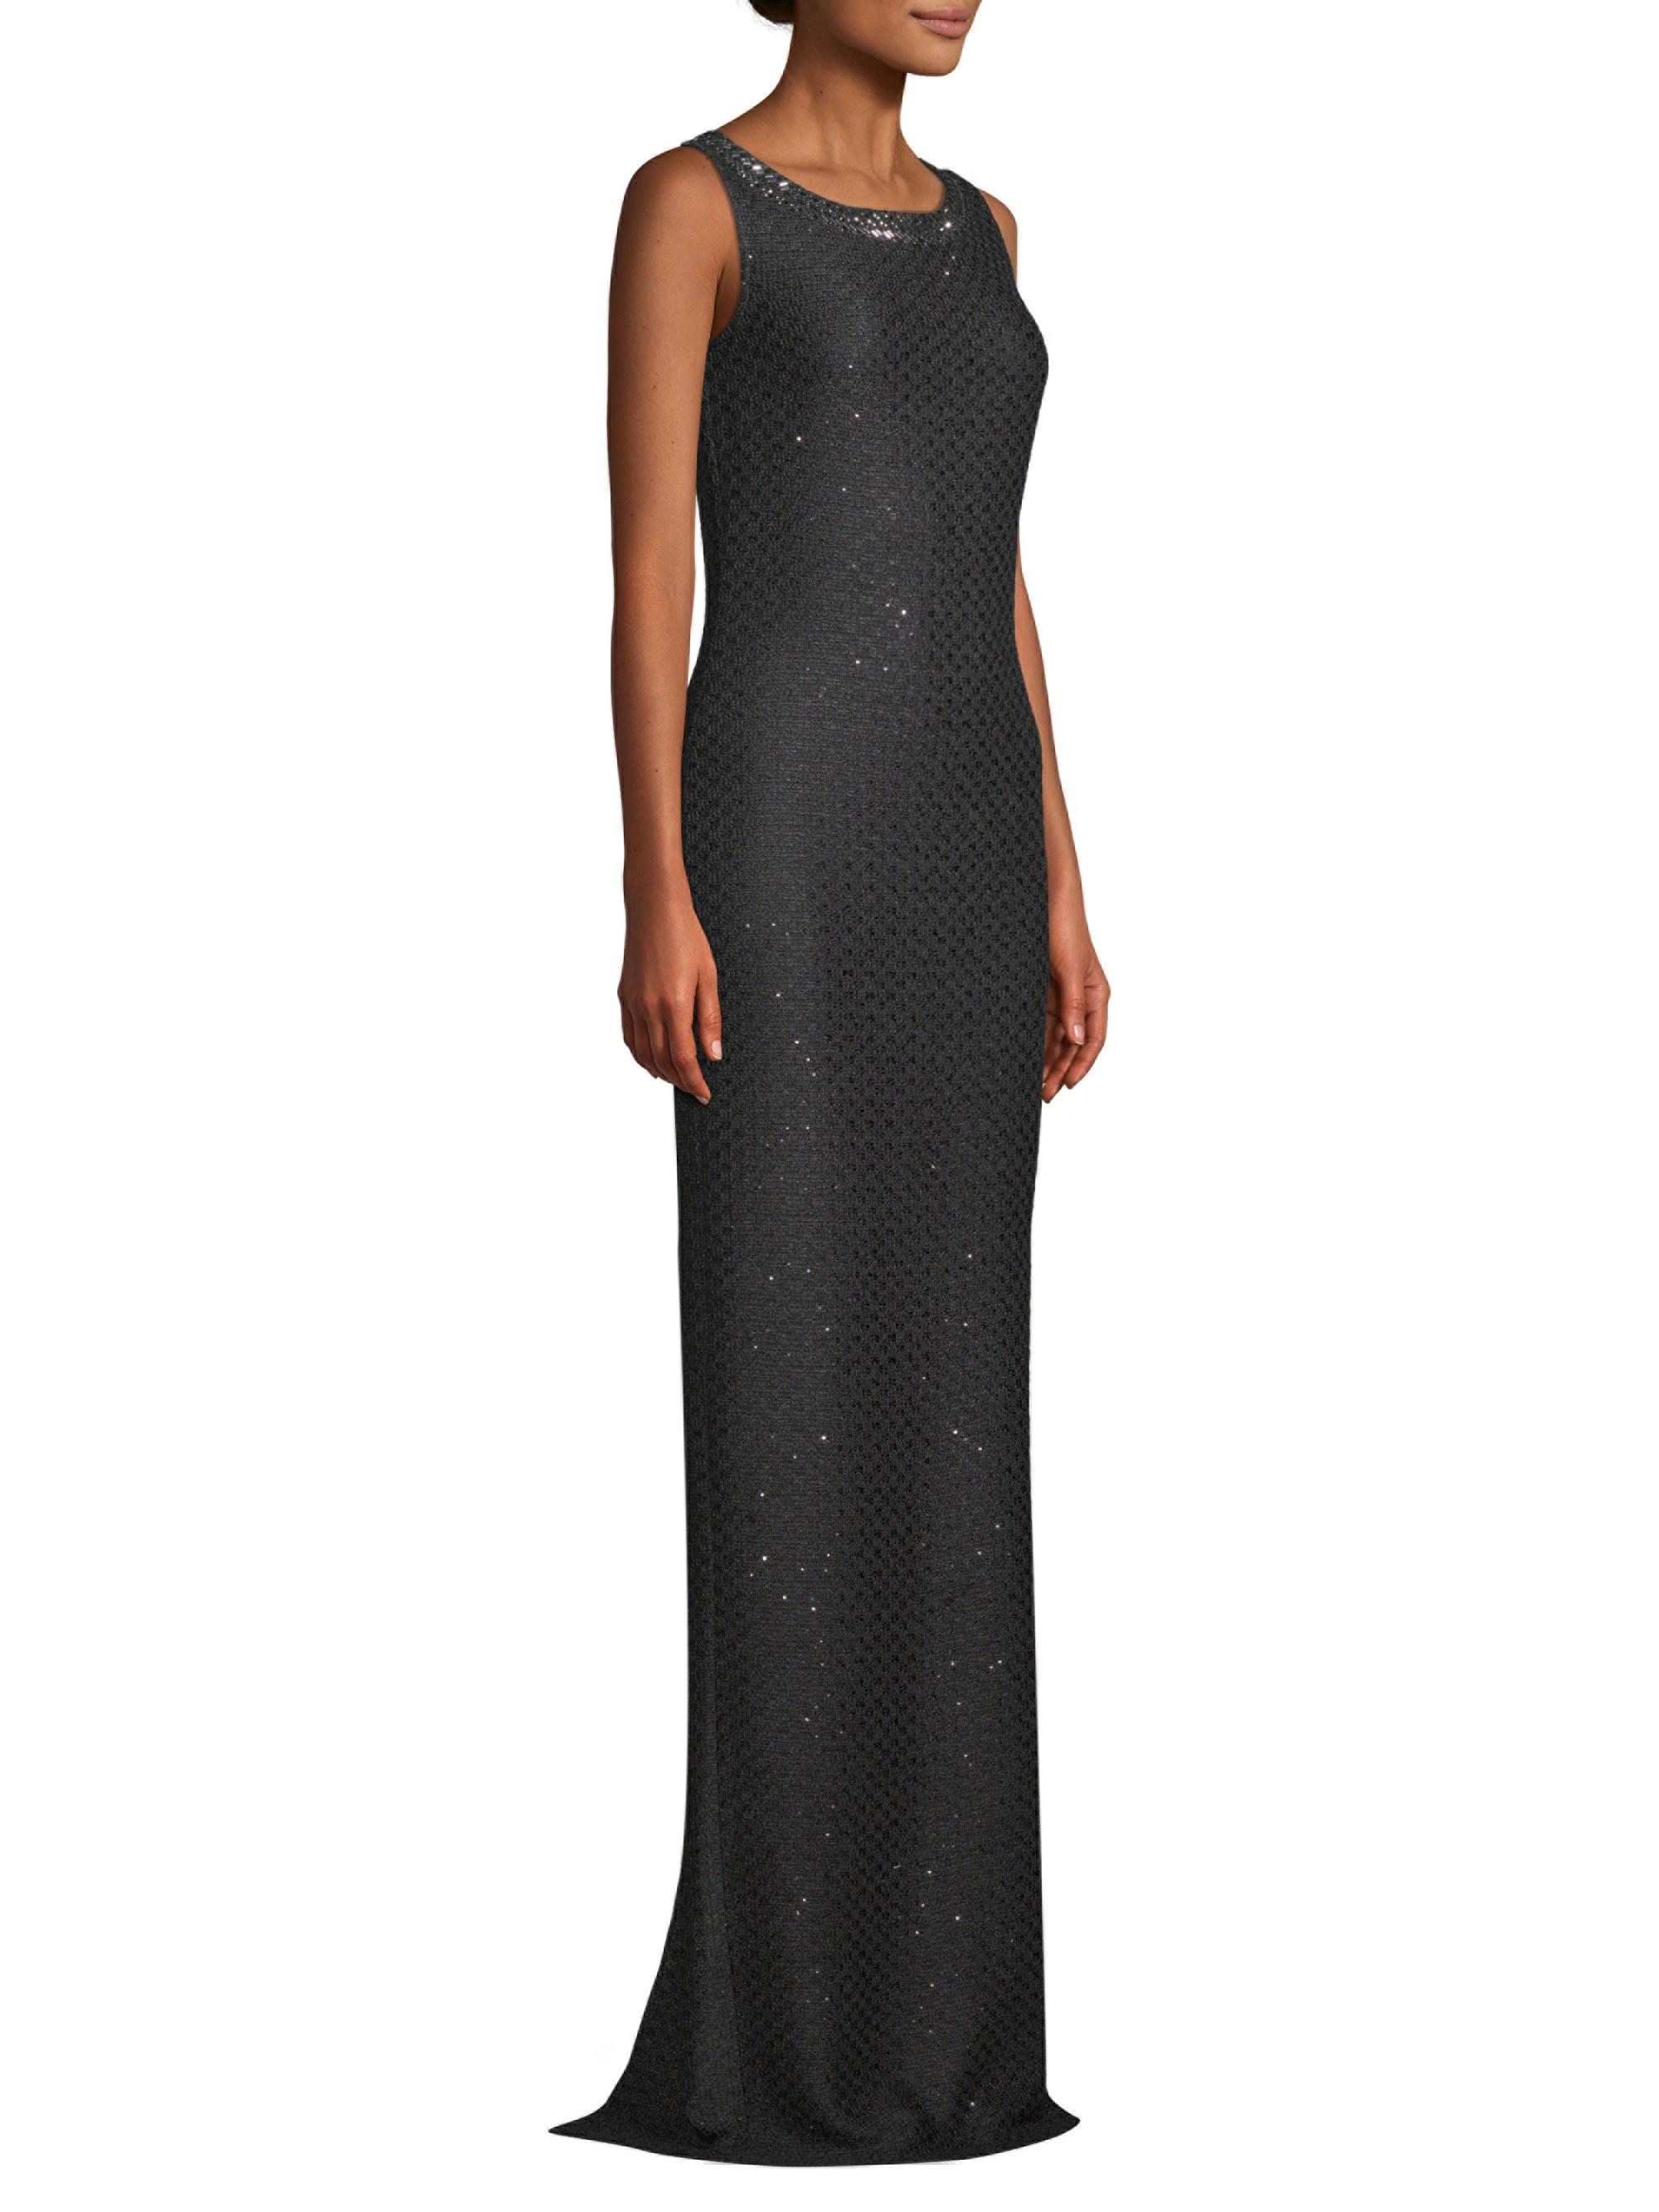 St. John Shimmer Sequin Knit Gown in Black - Lyst